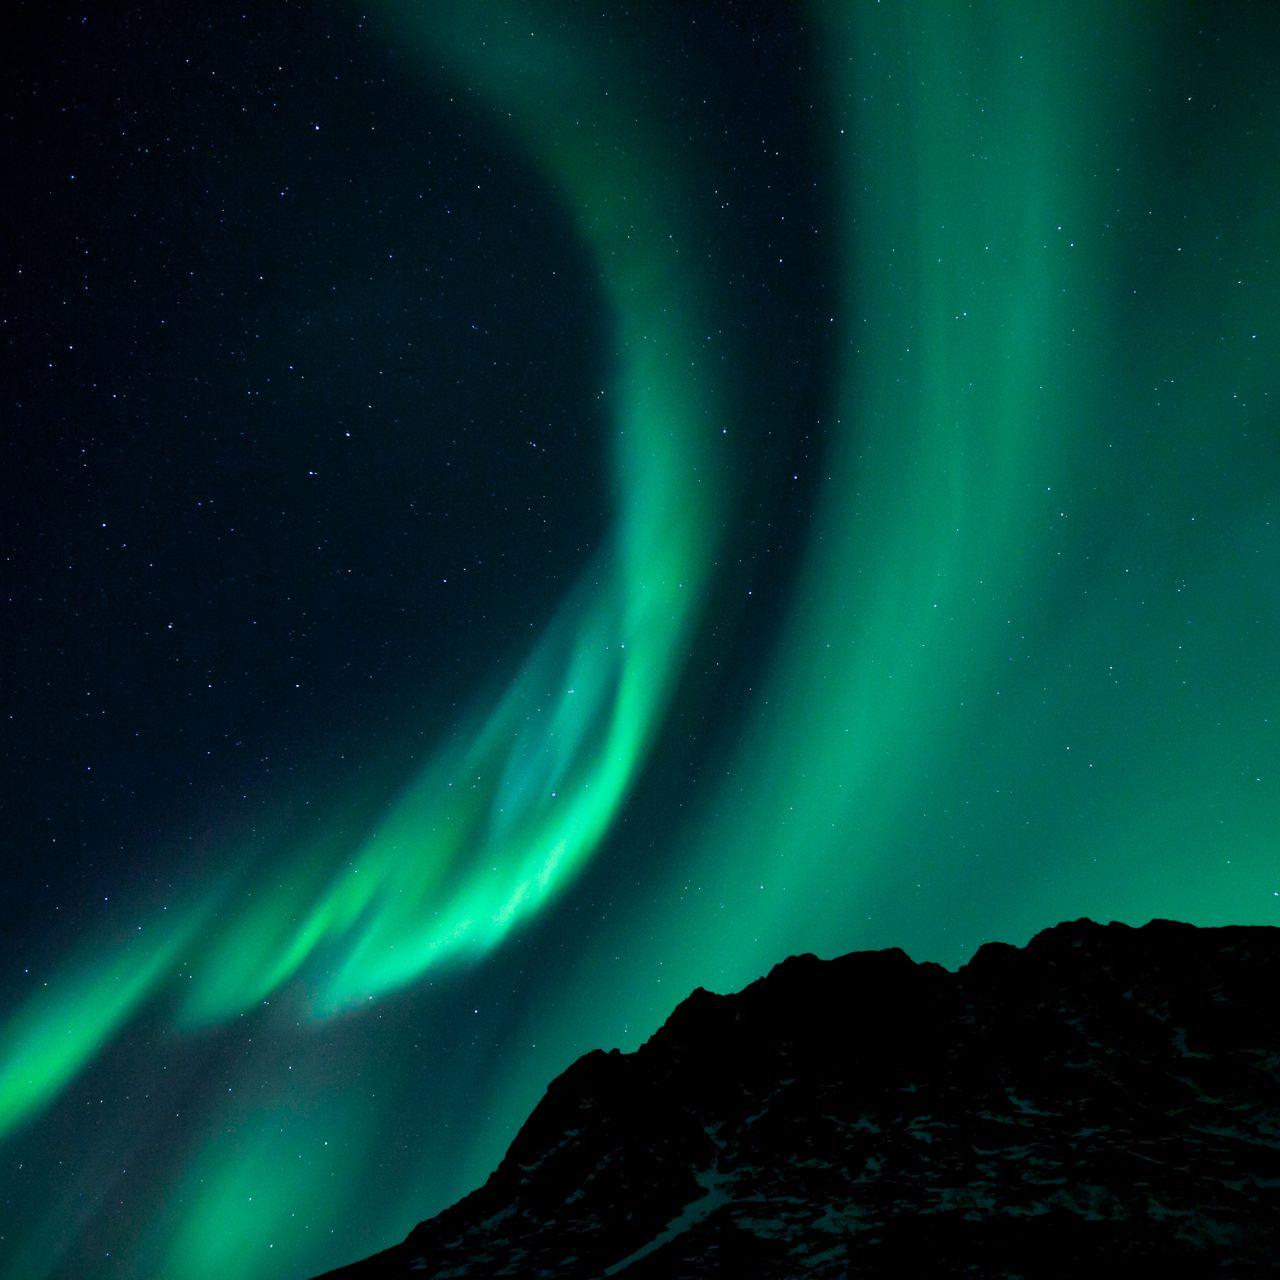 1280x1280 Wallpaper northern lights, night, night sky, phenomenon